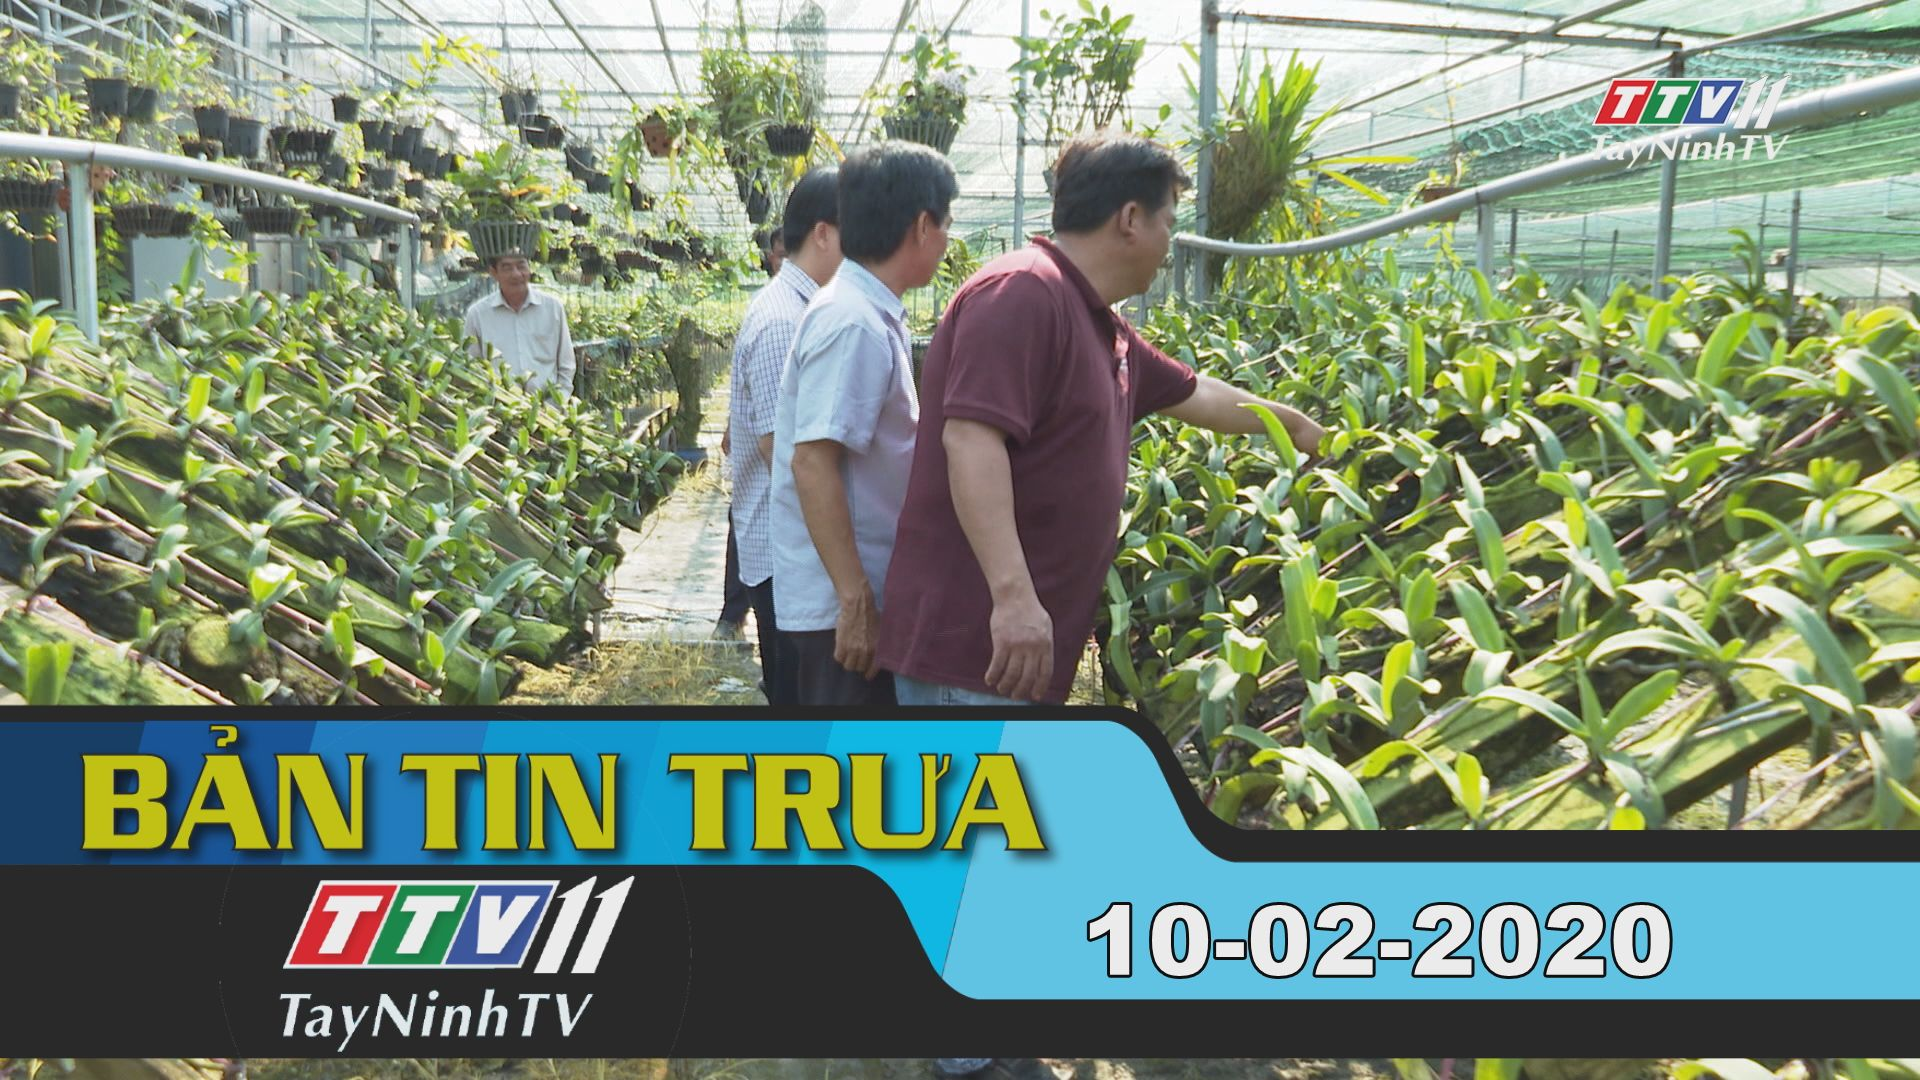 Bản tin trưa 10-02-2020 | Tin tức hôm nay | TayNinhTV